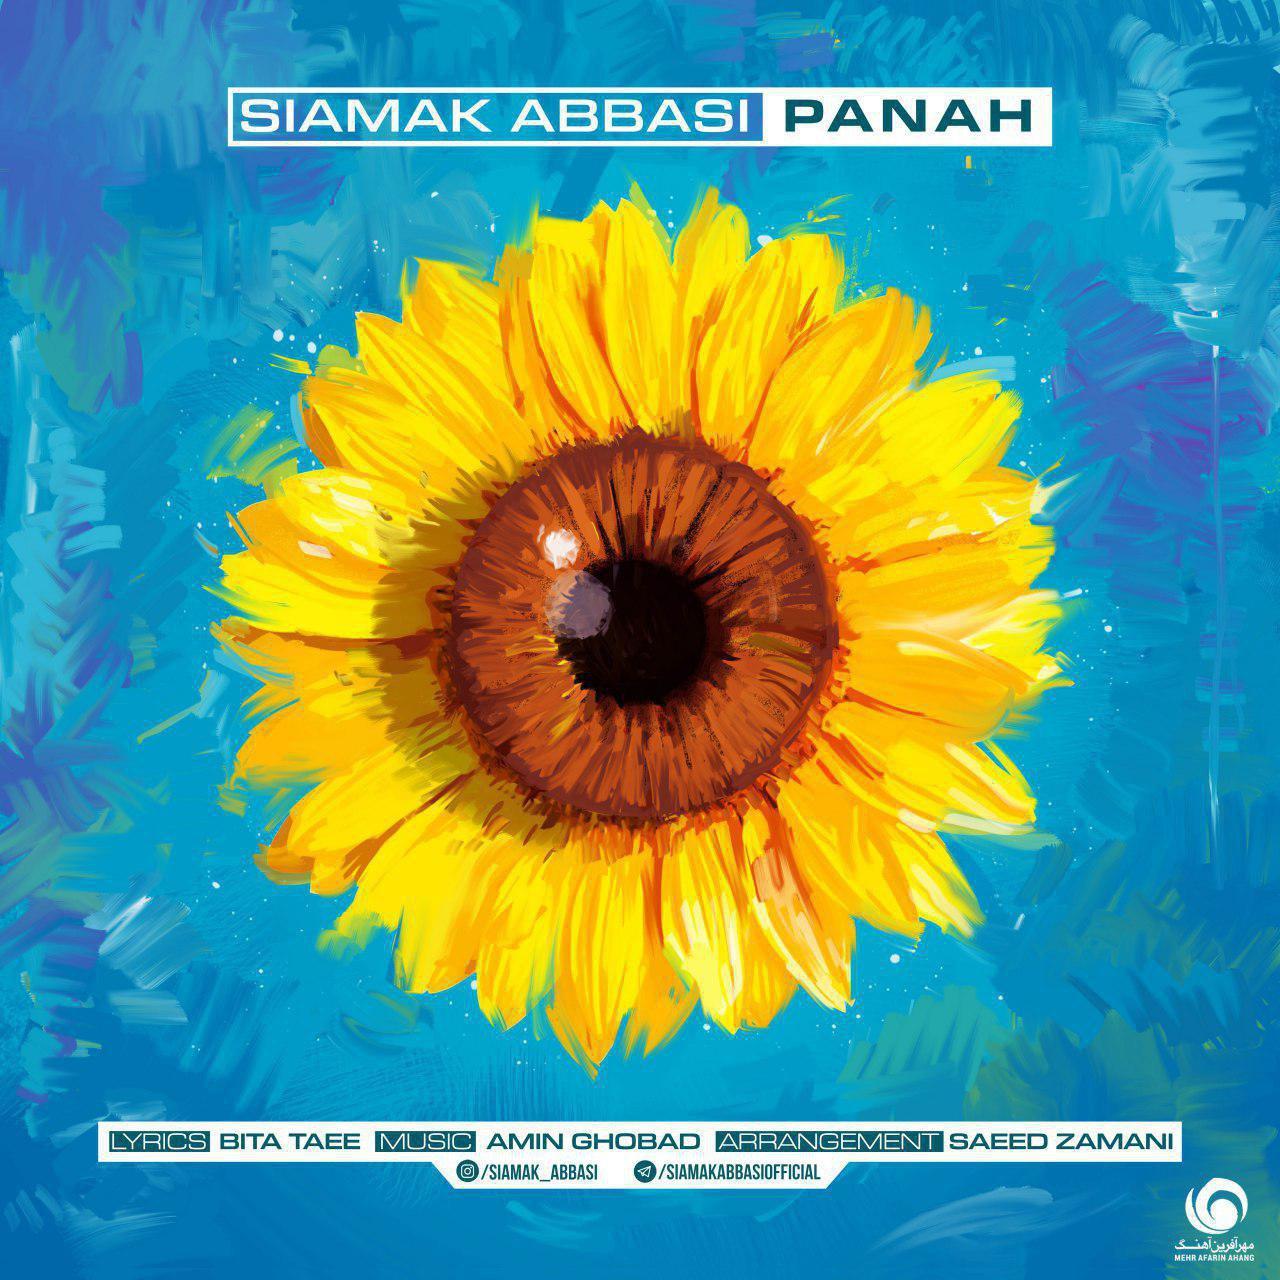 Siamak Abbasi - Panah